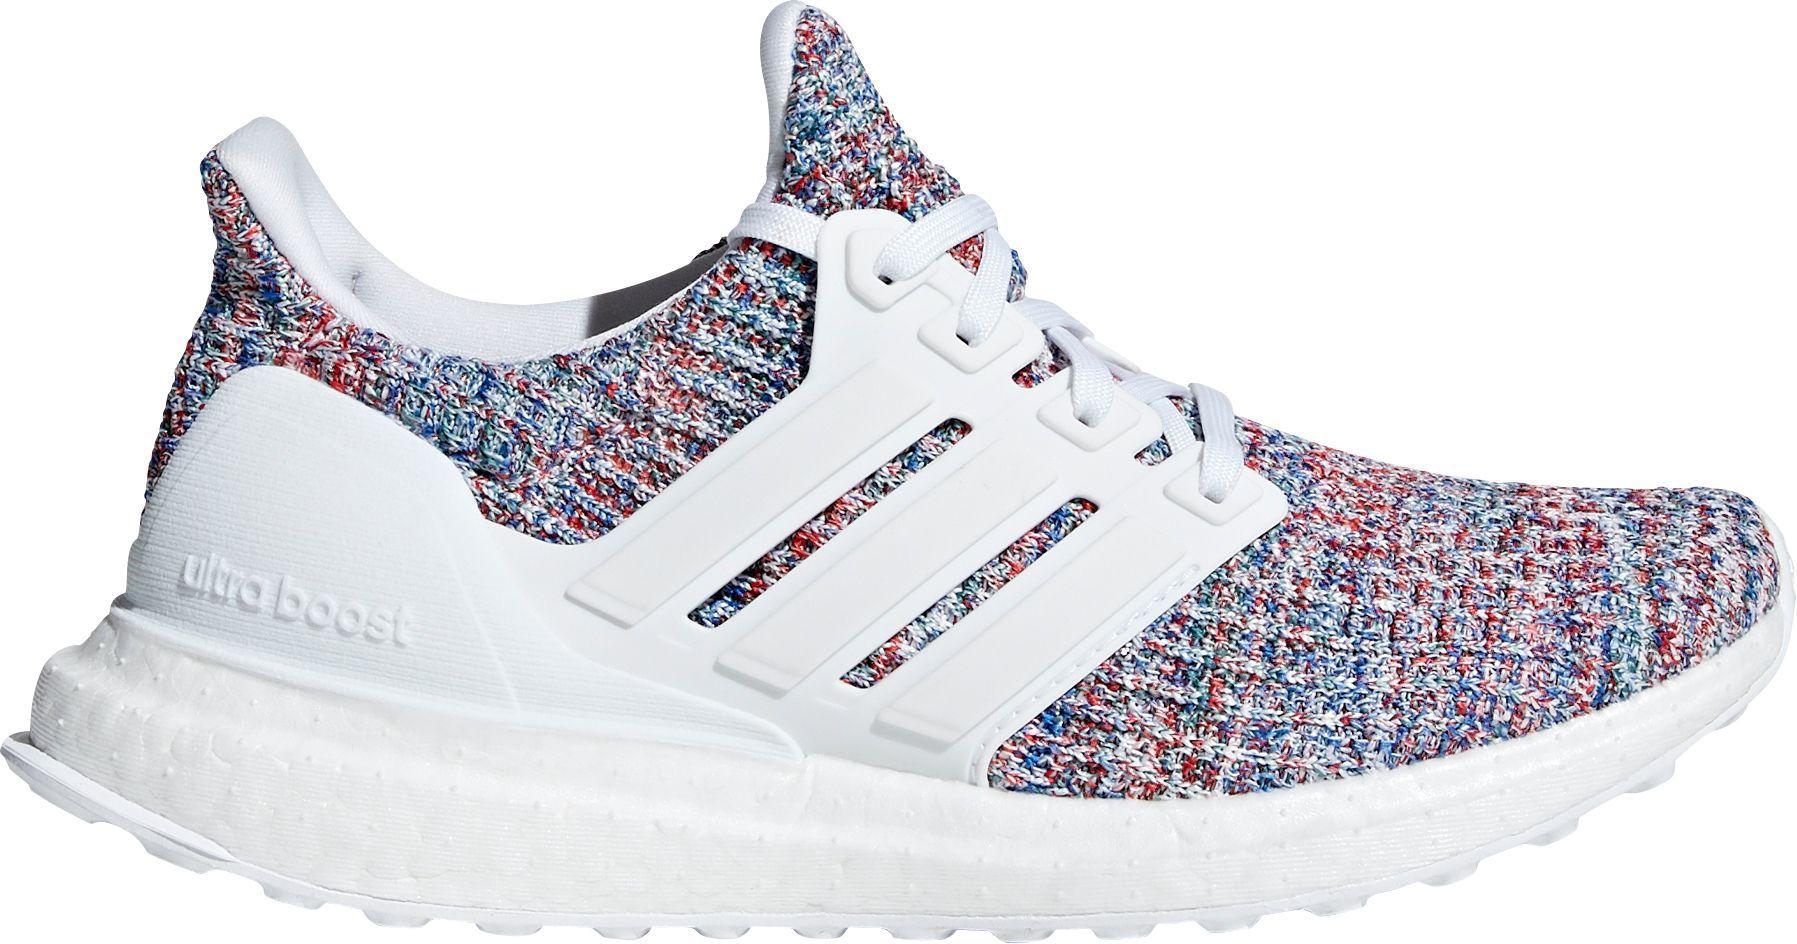 Adidas Ultra Boost On Feet Women wallbank lfc.co.uk